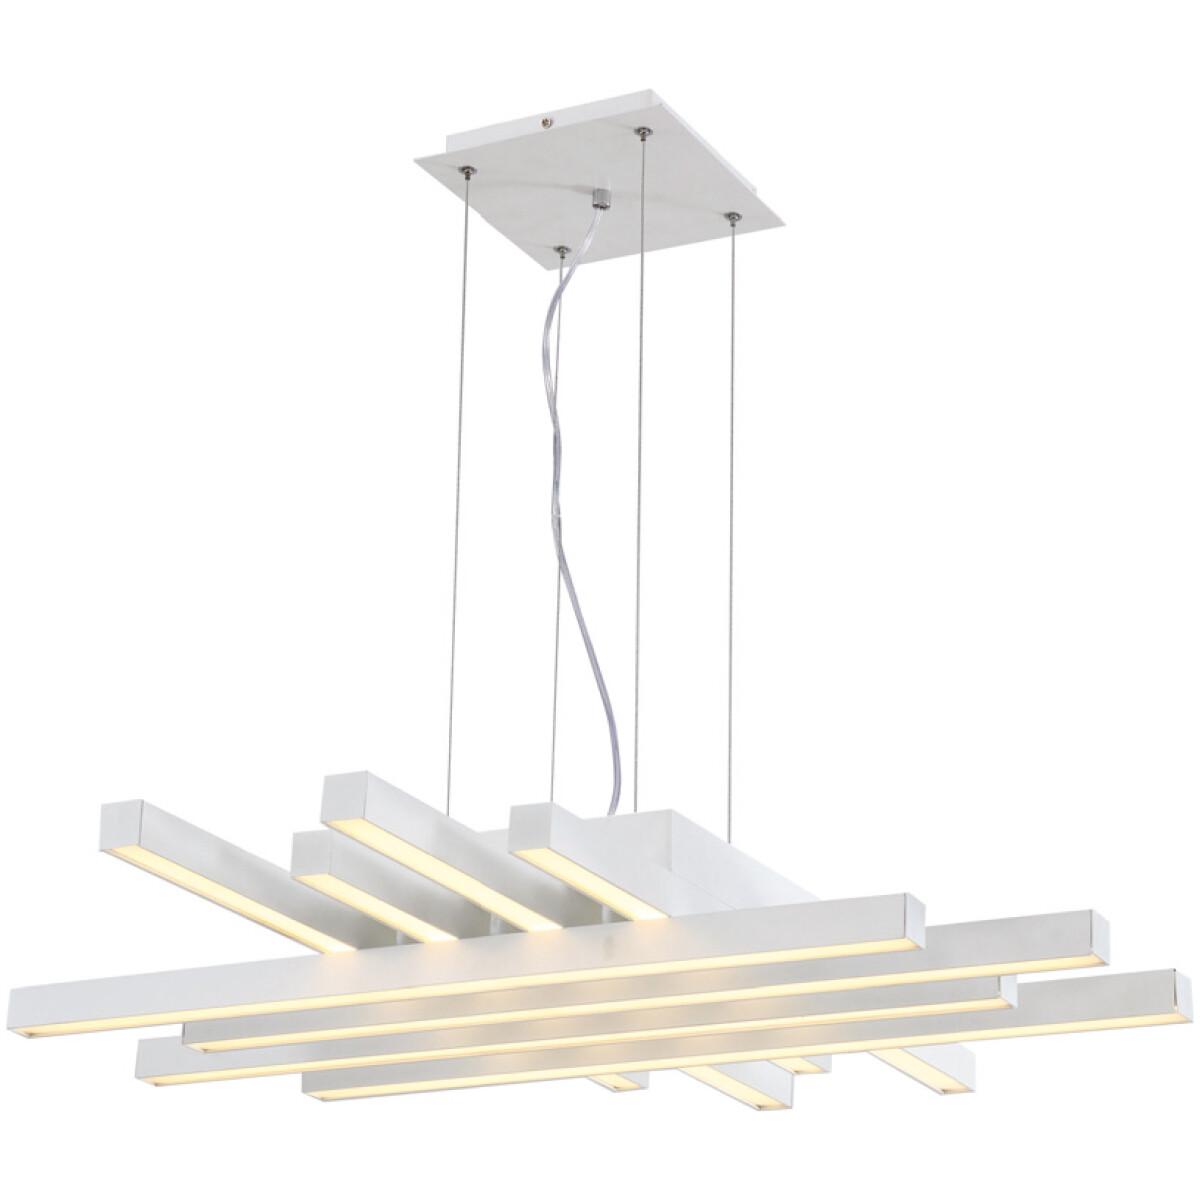 LED Hanglamp - Hangverlichting - Asfino - 85W - Natuurlijk Wit 4000K - Mat Wit - Aluminium